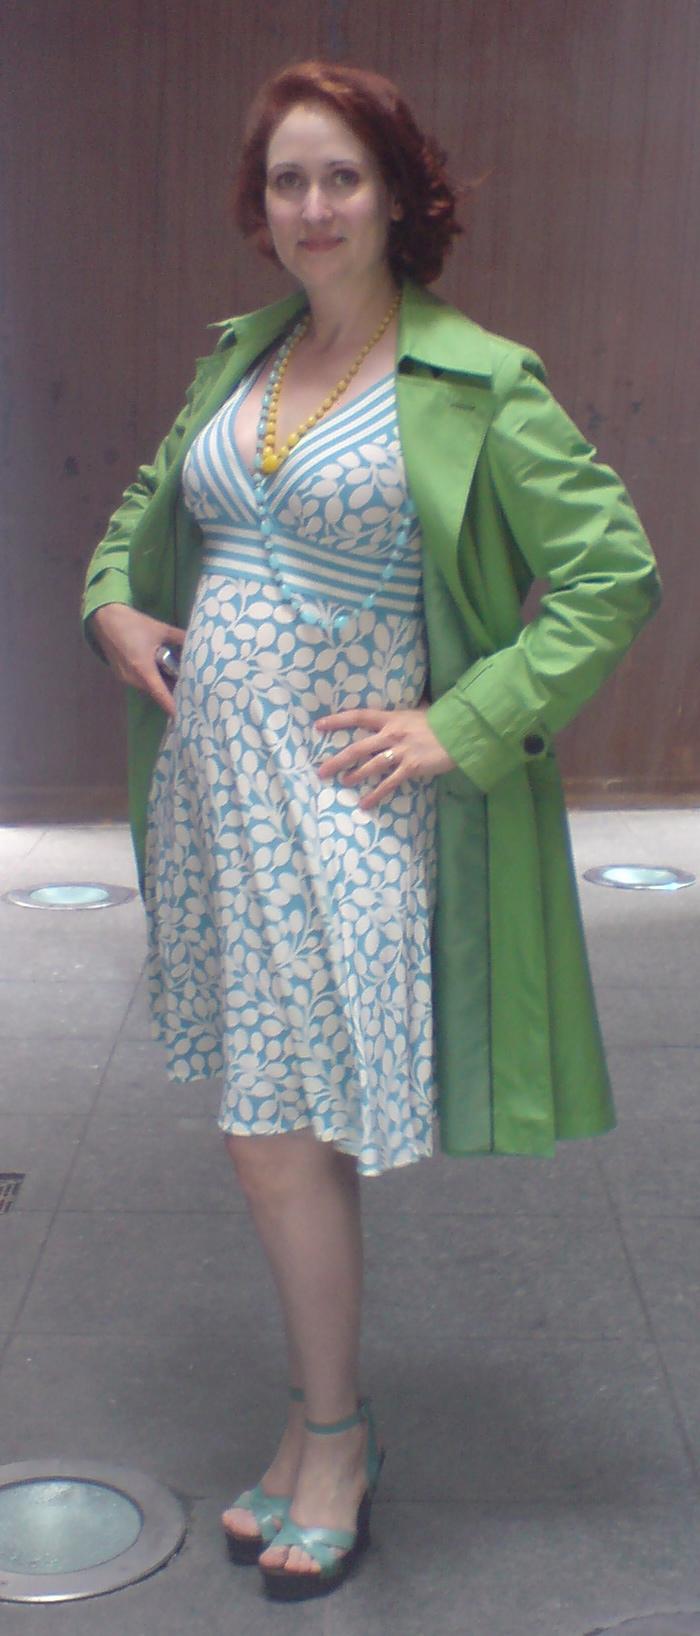 4 months pregnant, June 2008